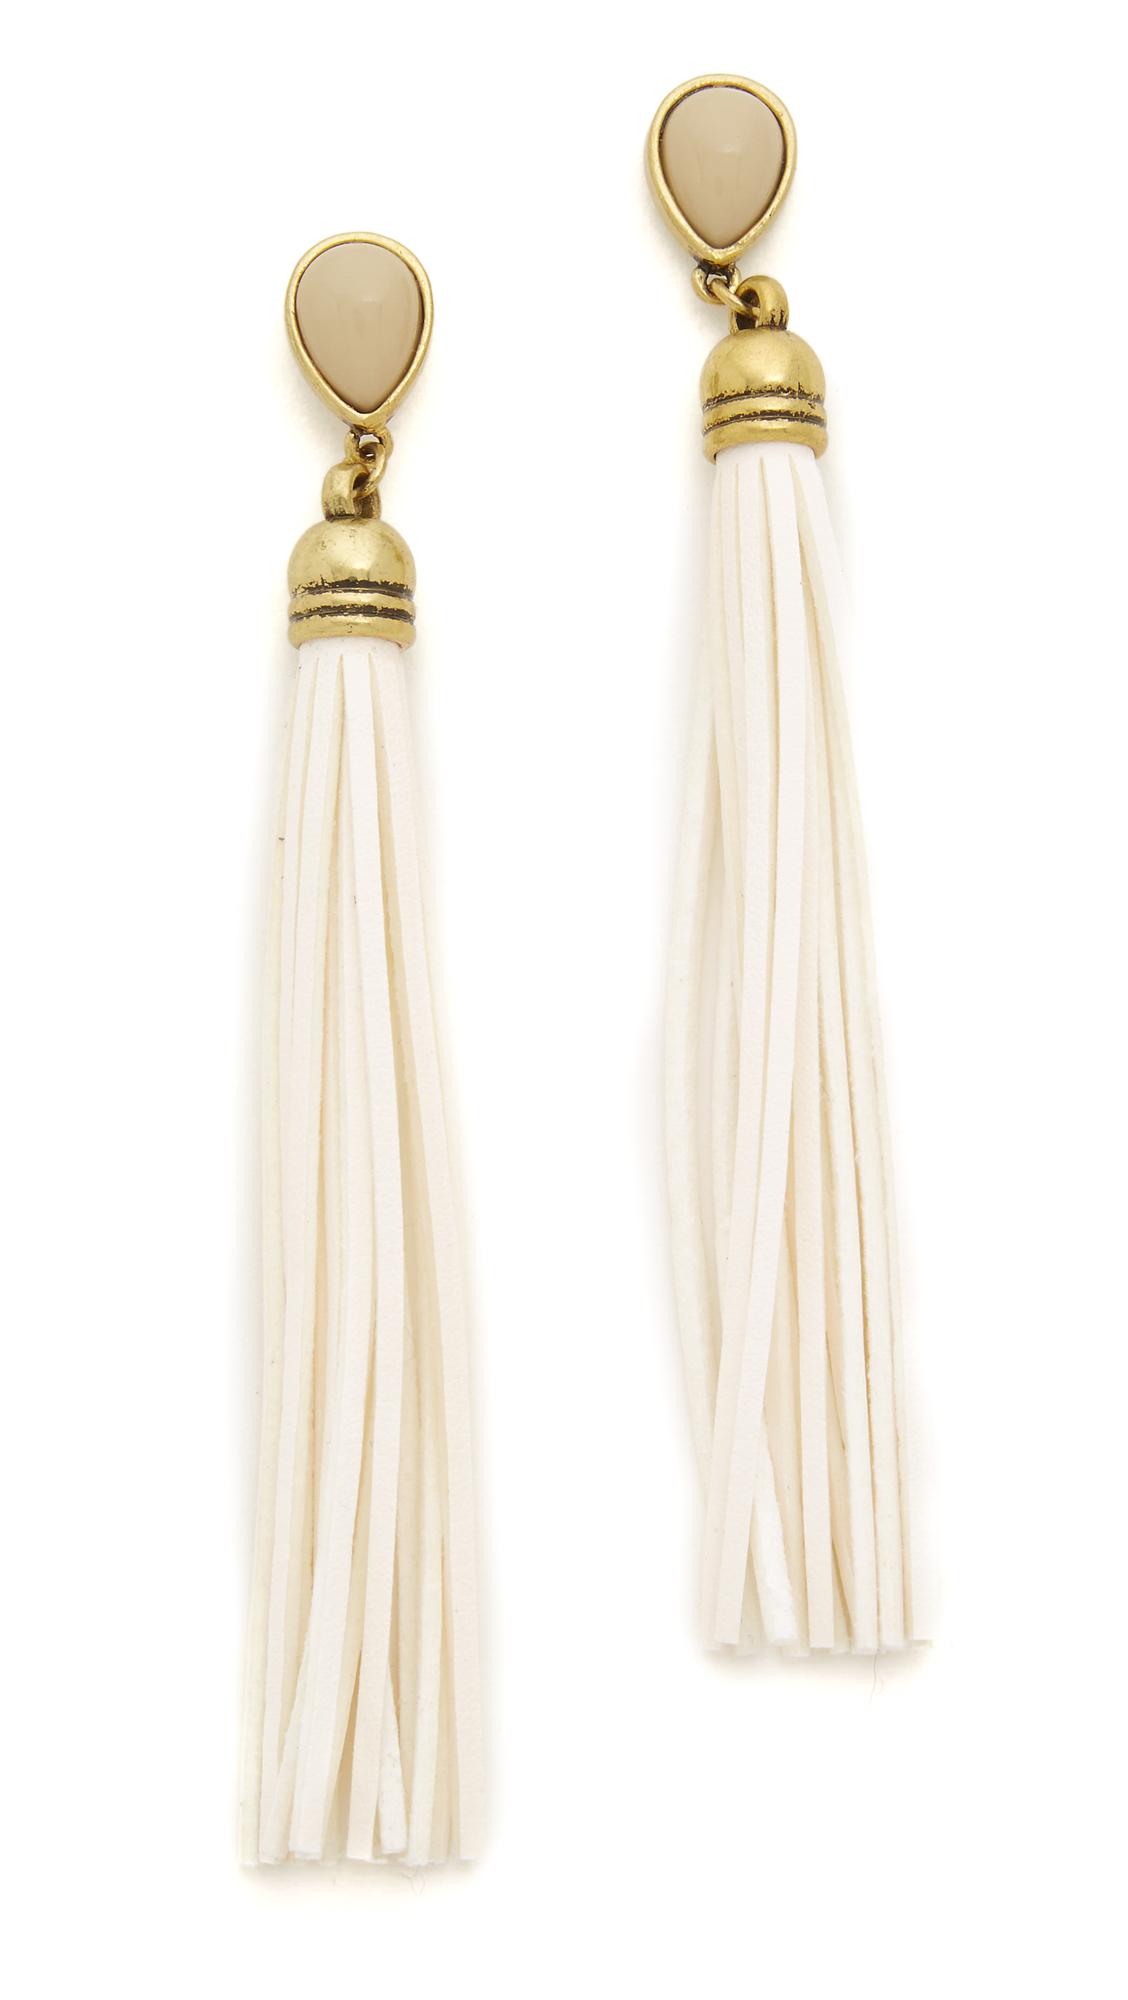 Adia kibur Stella Earrings in Metallic